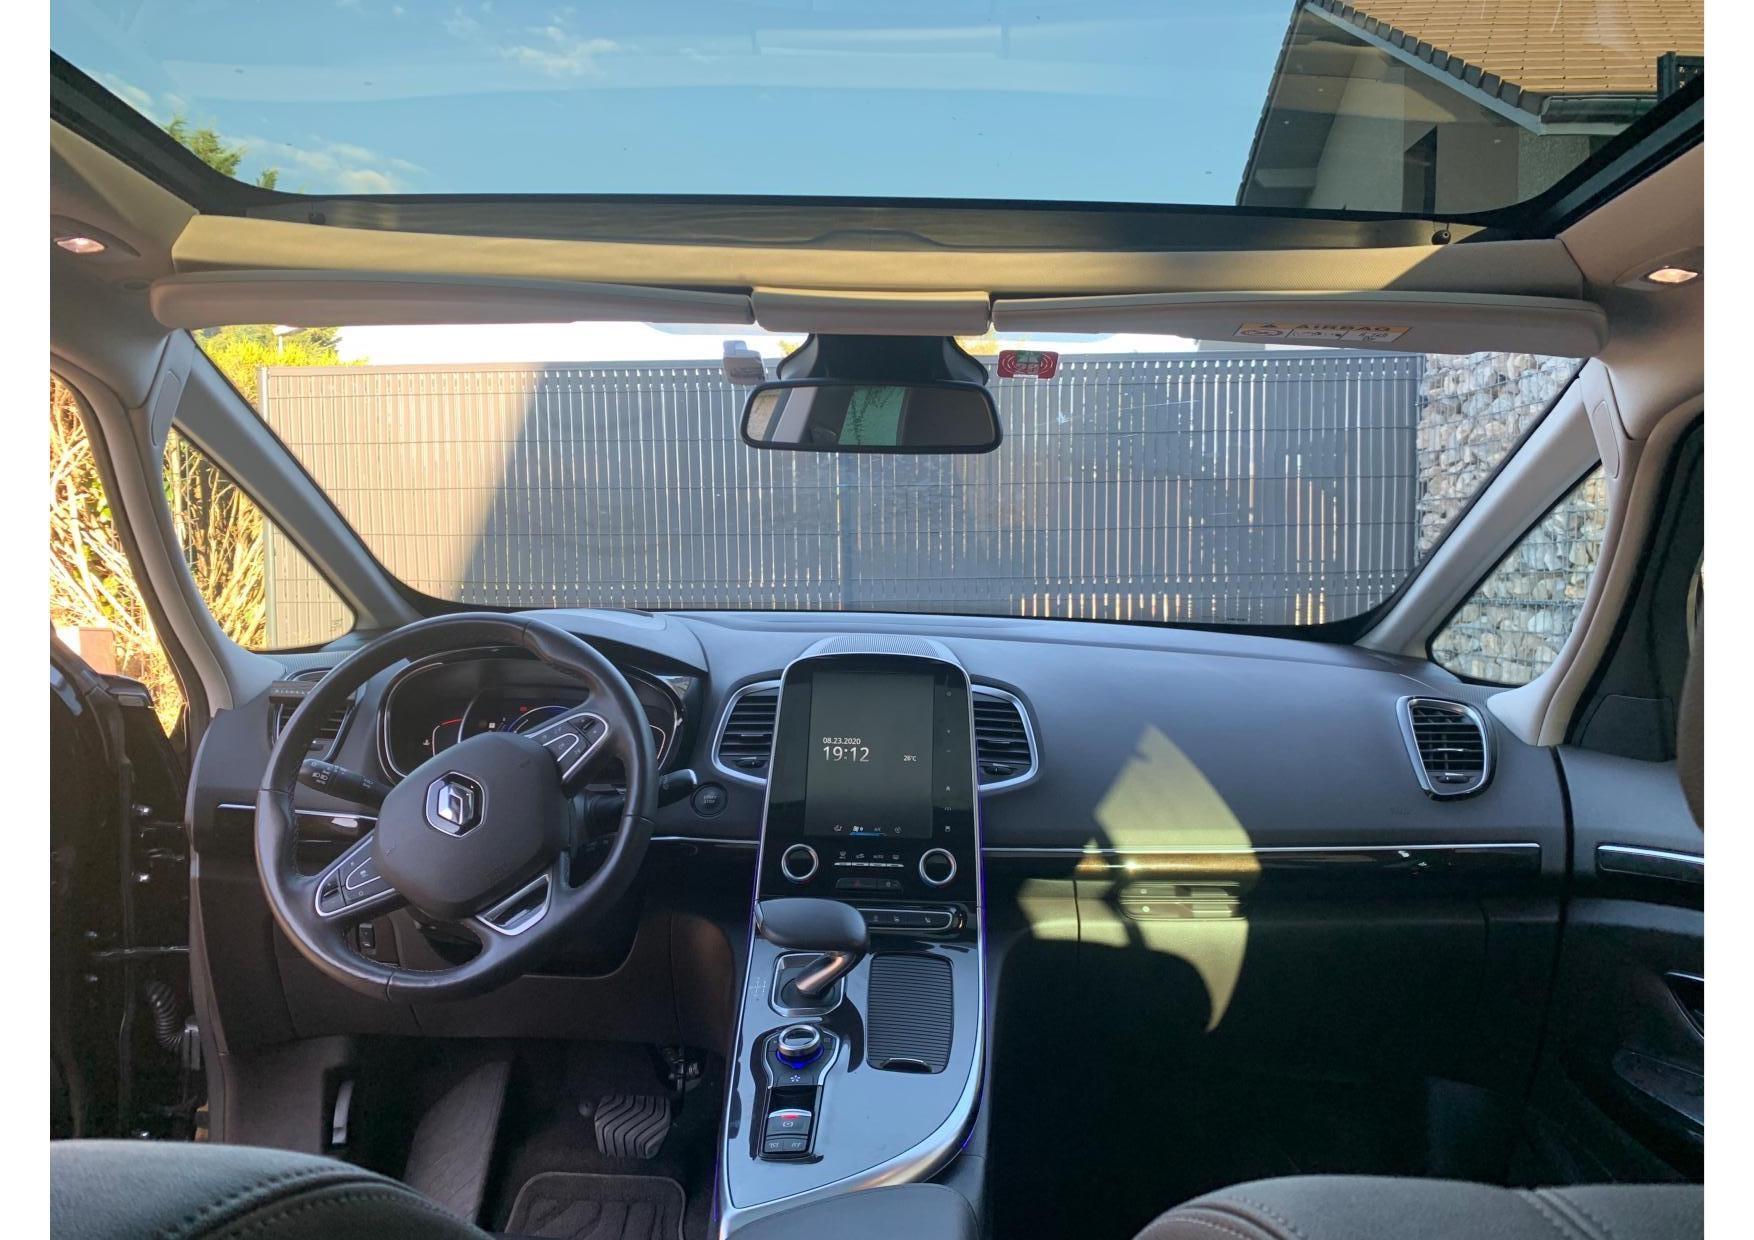 Renault Espace 1.8 TCe 225 Intens EDC